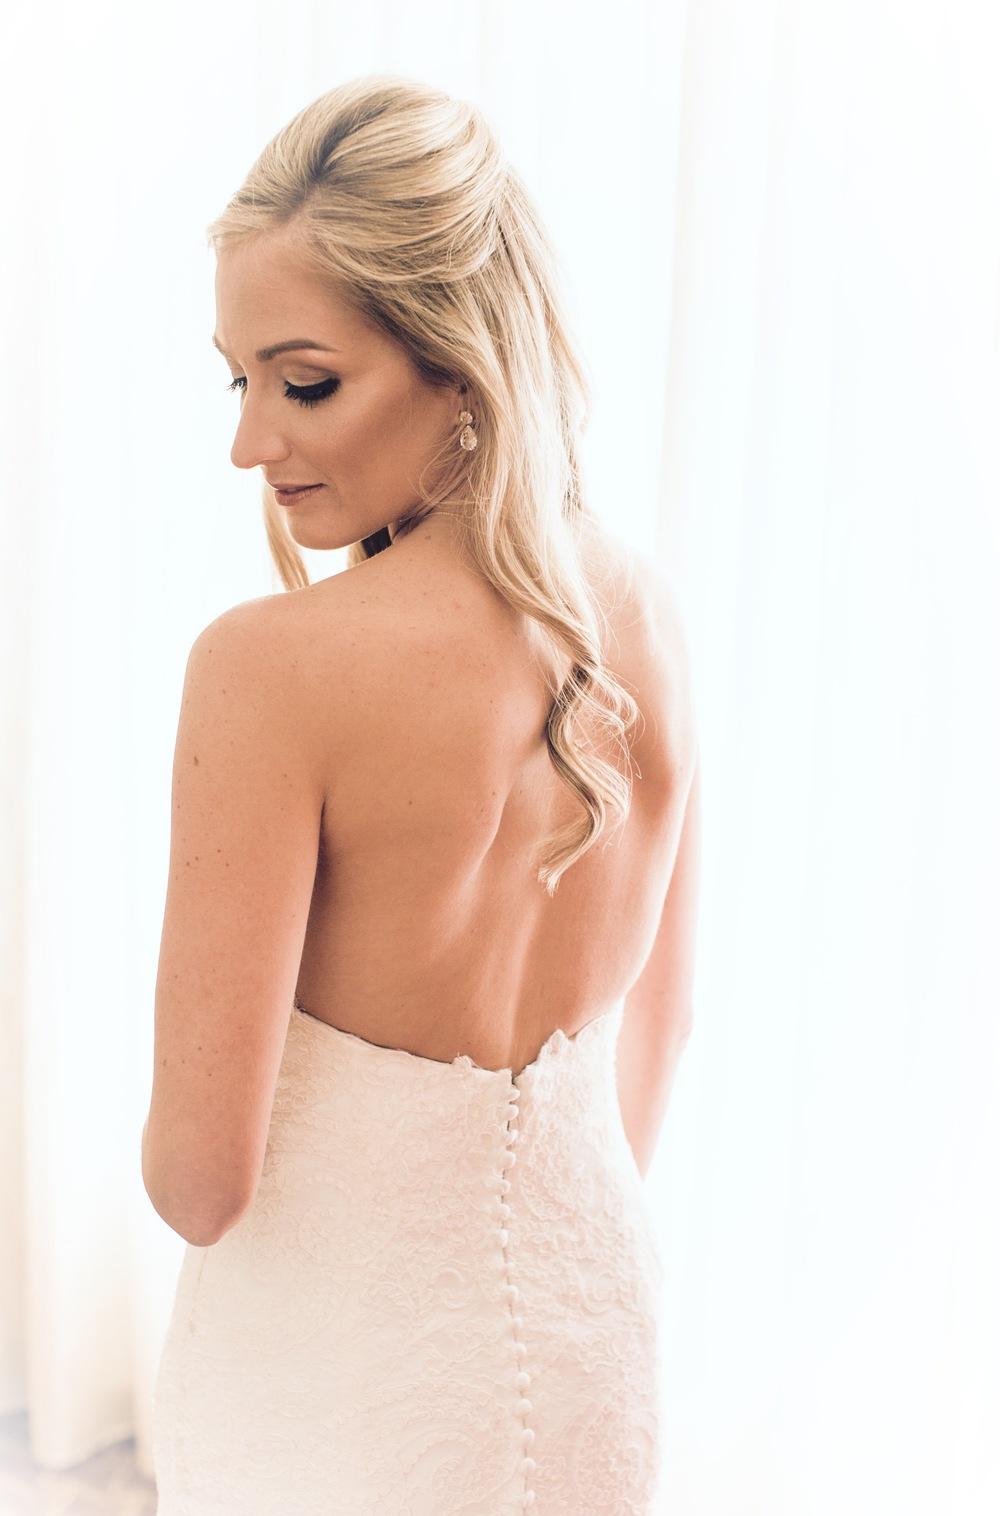 Baltimore Harbor East Weddings | Makeup for Bridal | Tymia Yvette